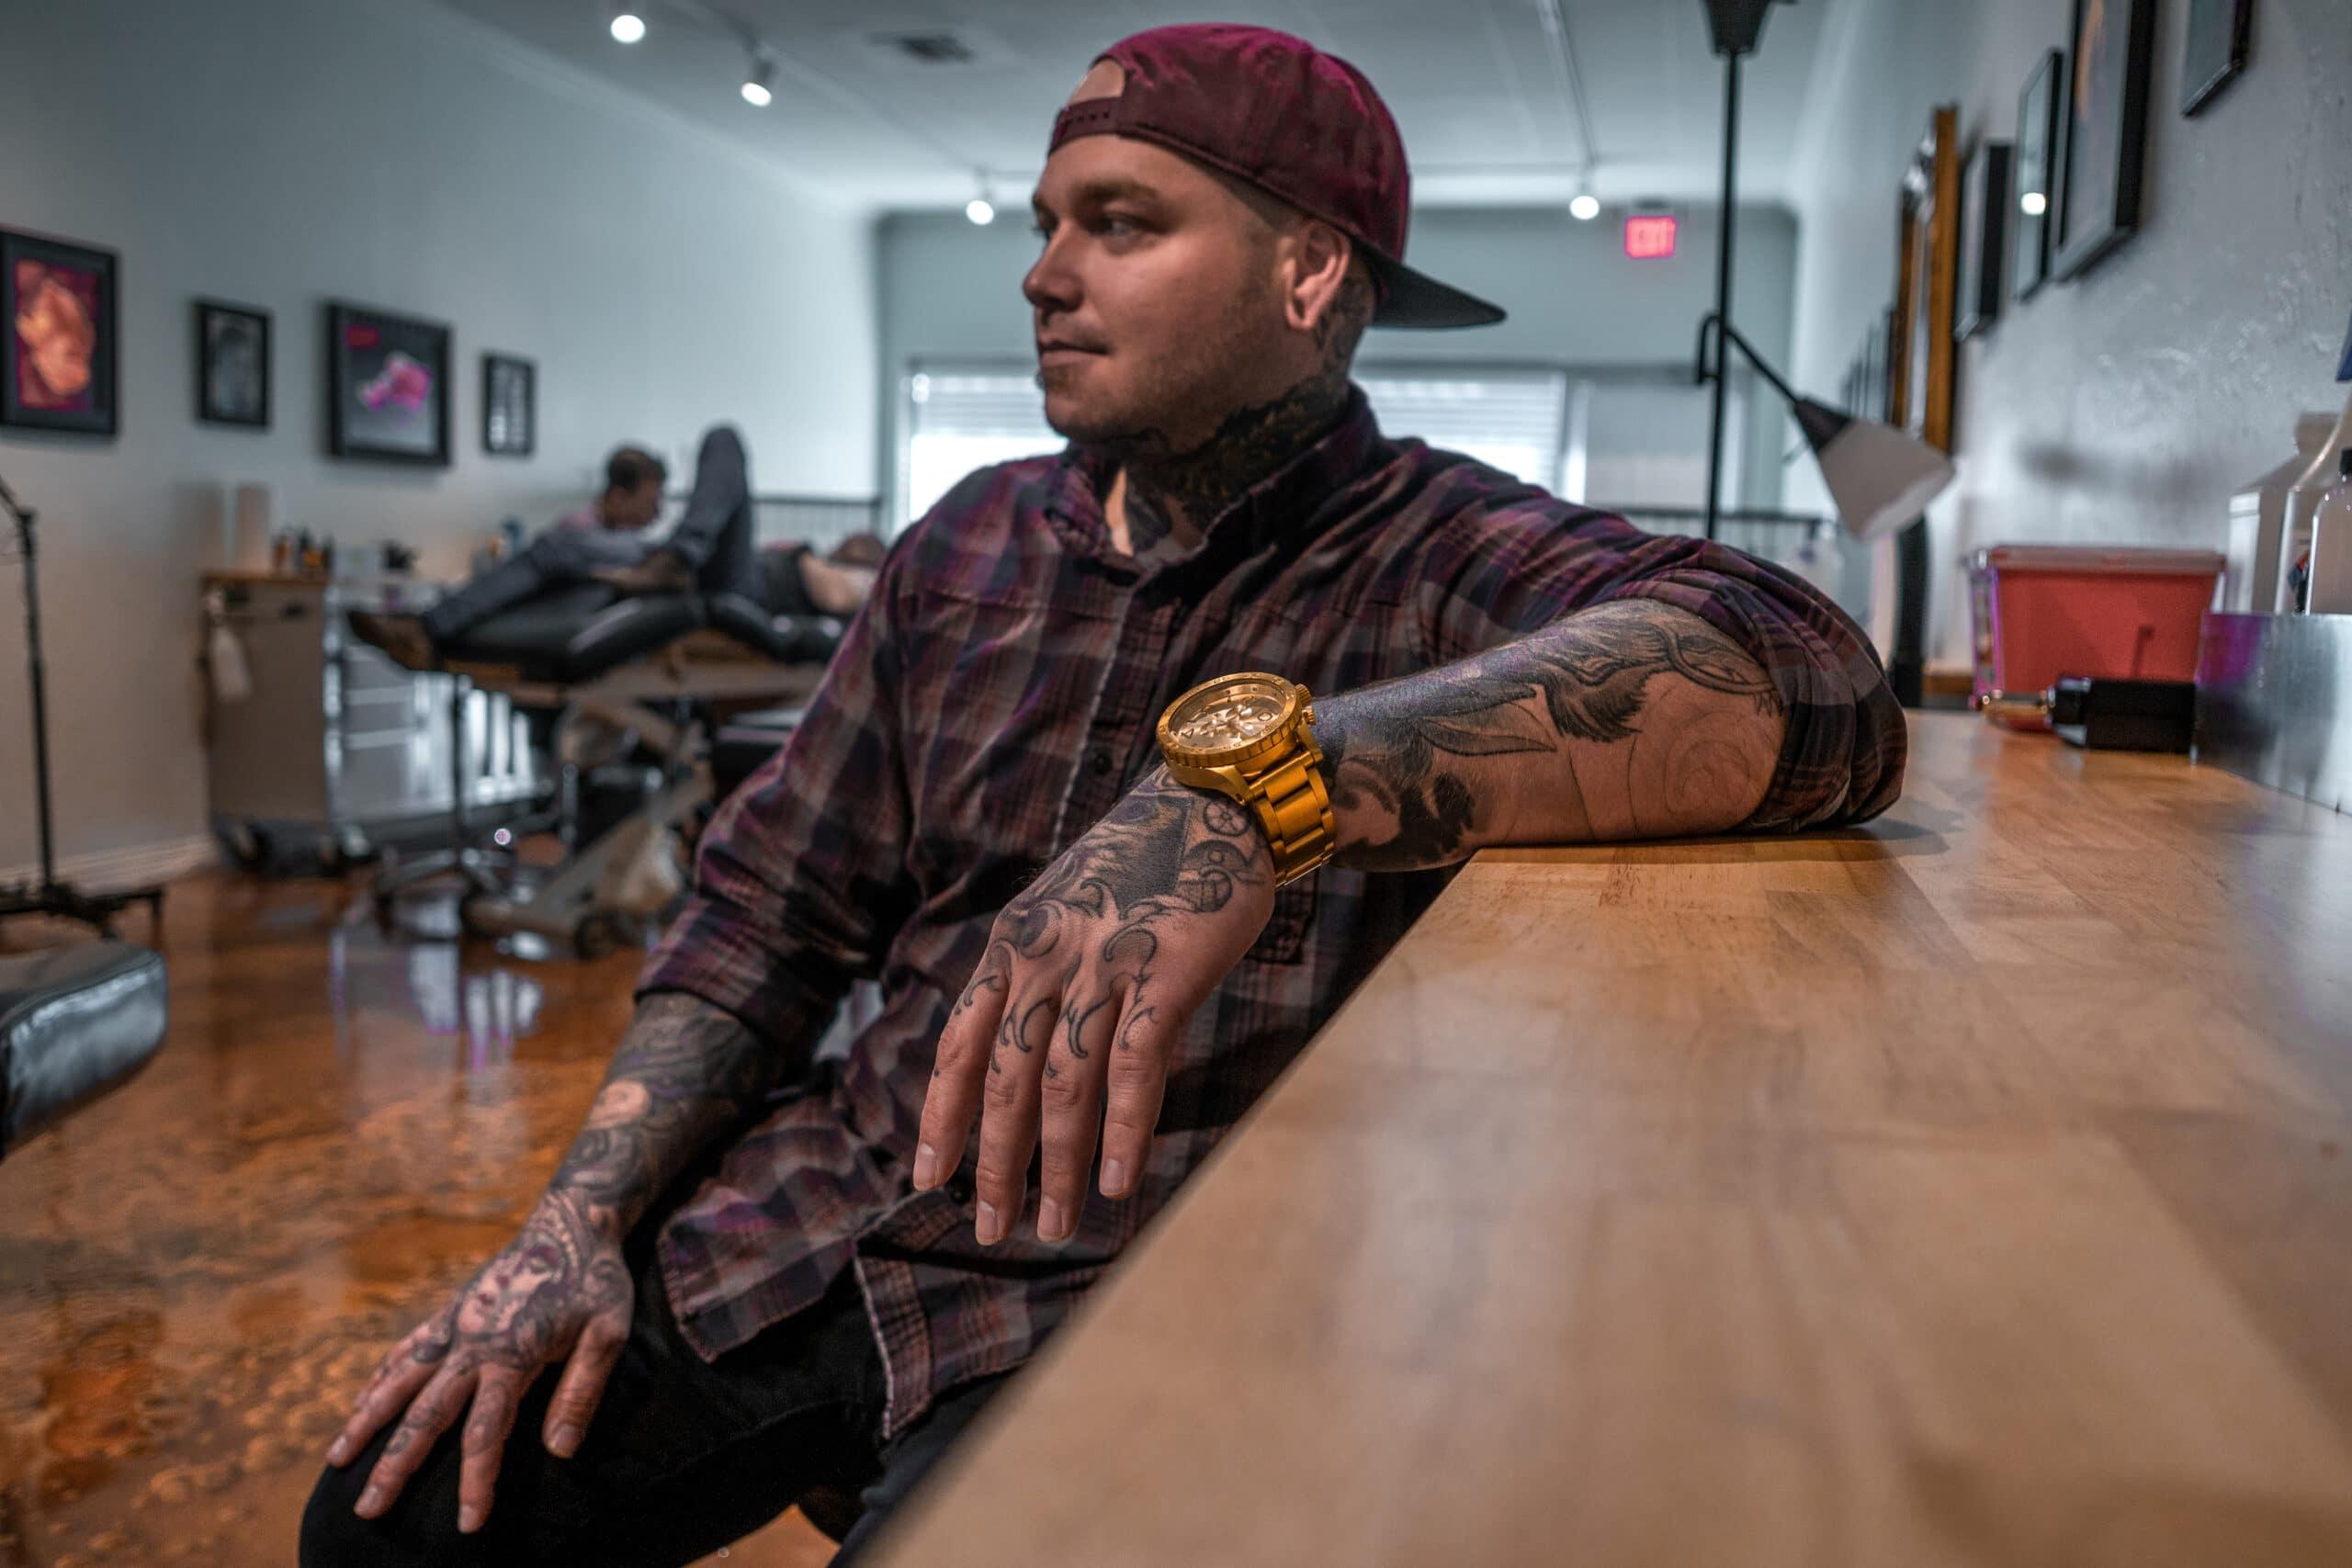 Charles Taylor sitting at his tattoo station